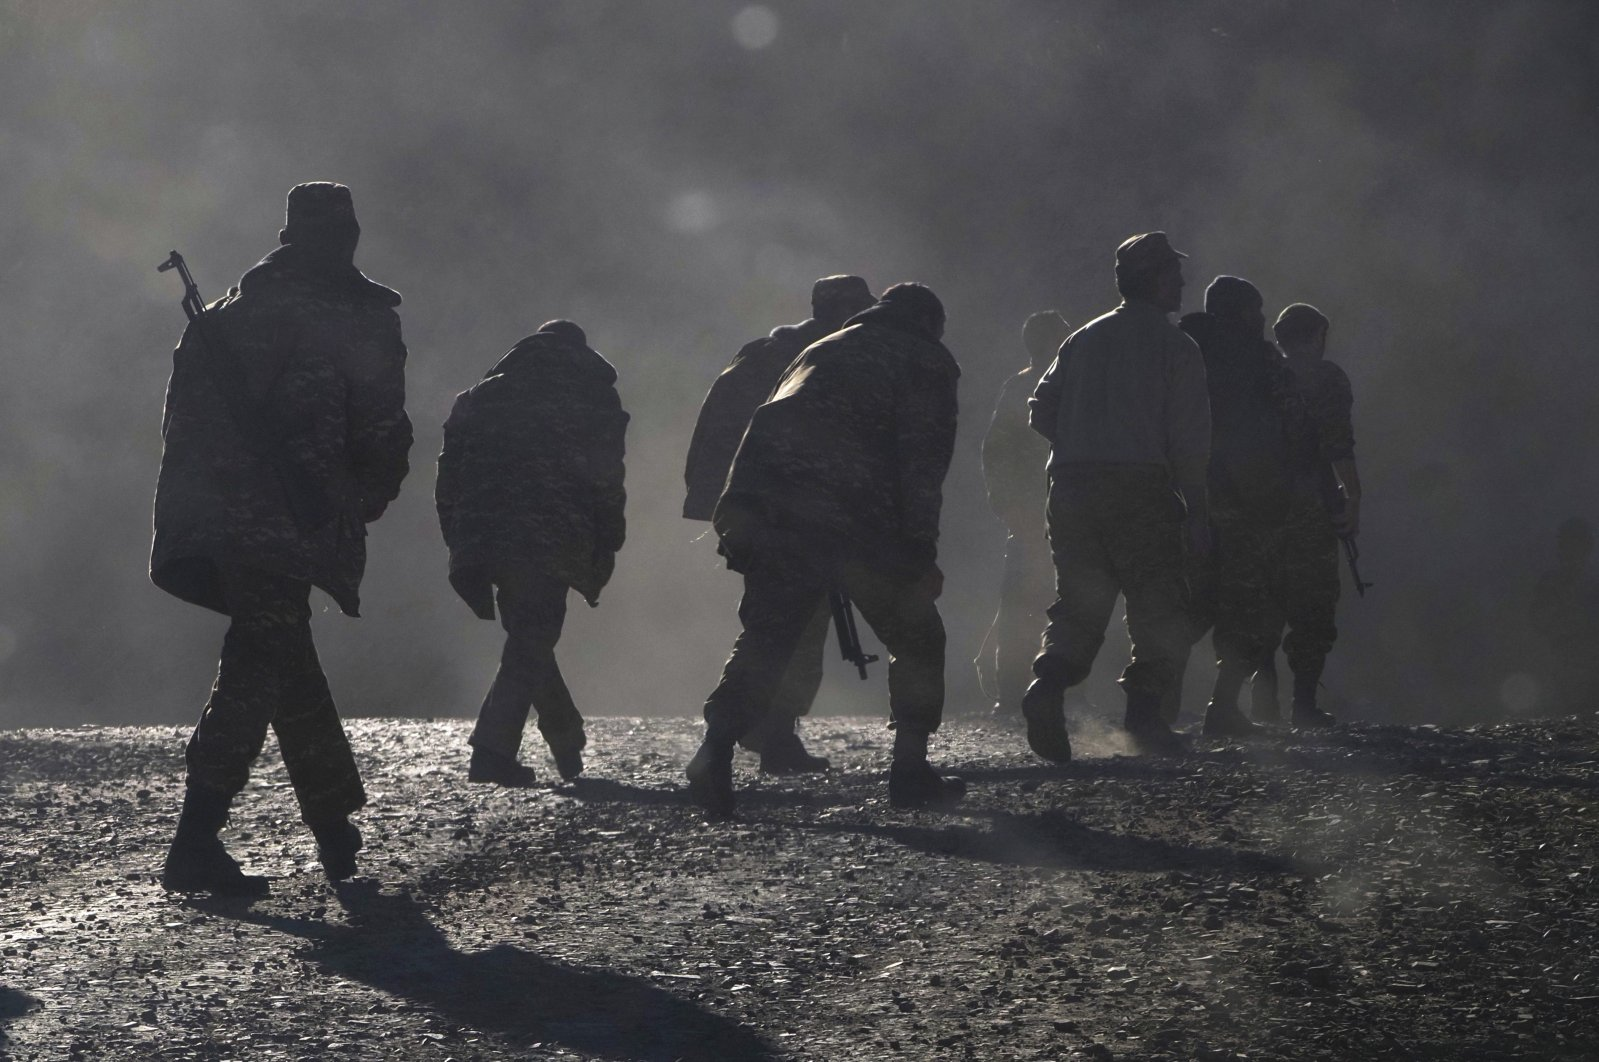 Armenian soldiers walk along the road near the border between Armenia and Nagorno-Karabakh, Azerbaijan, Nov. 8, 2020. (AP Photo)